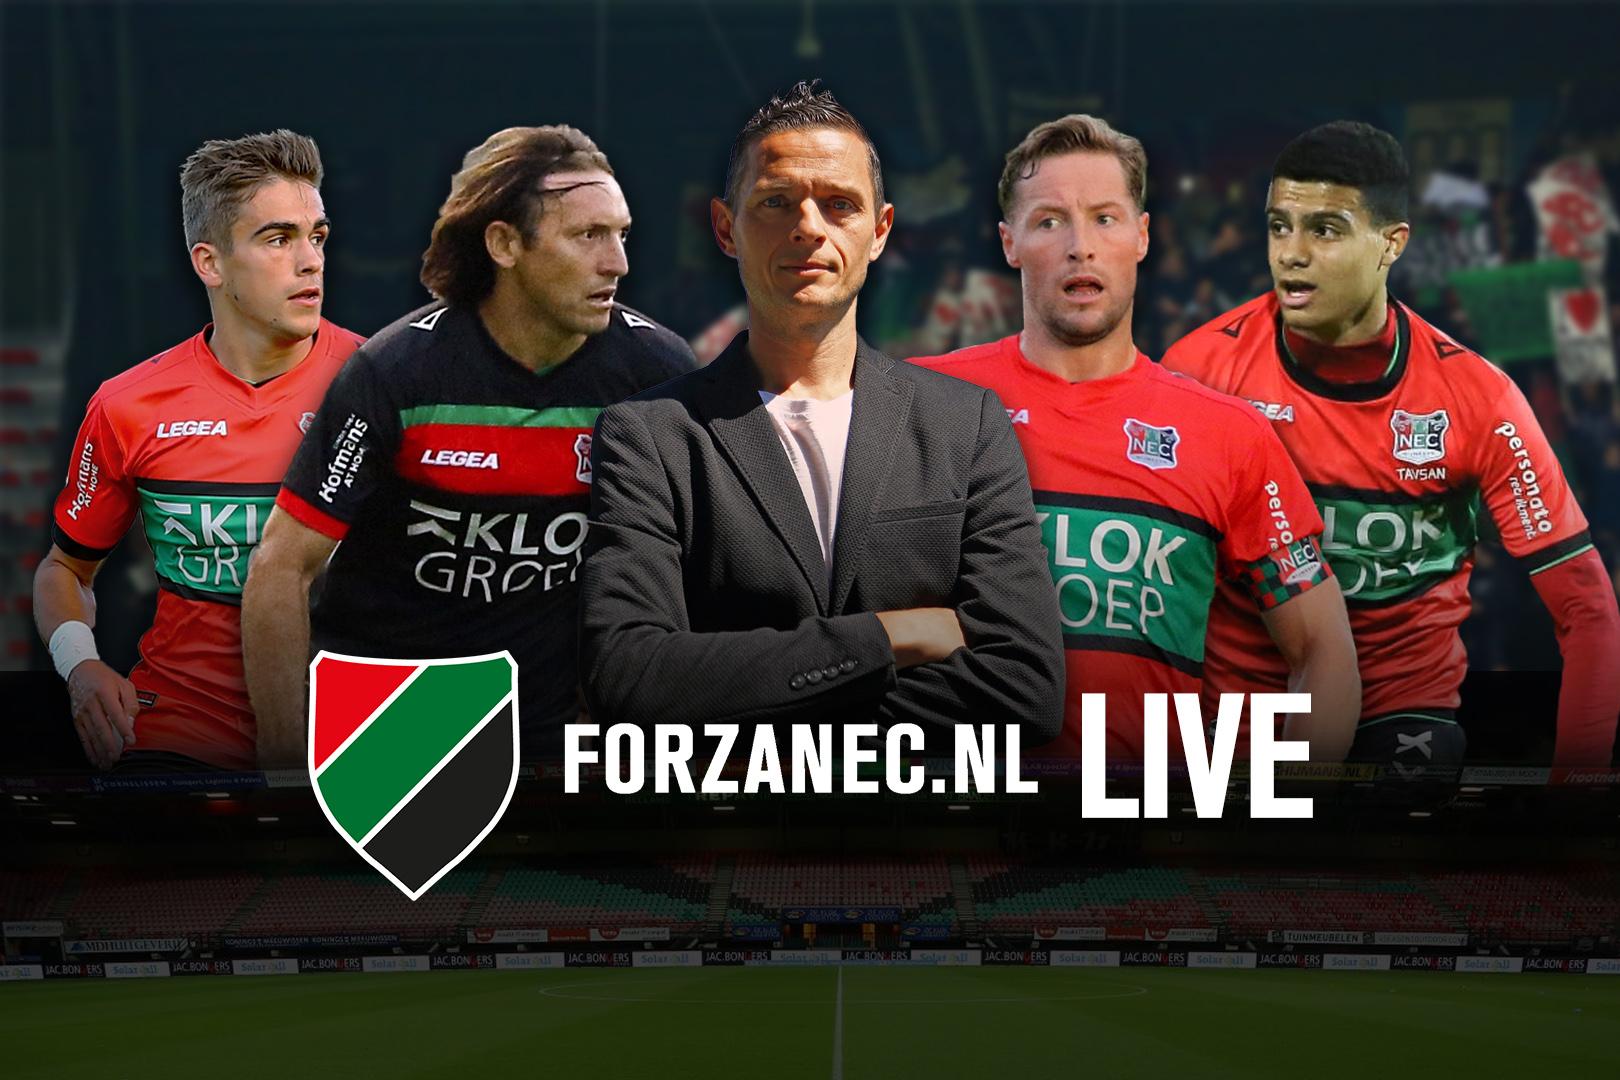 Liveblog: FC Eindhoven – NEC